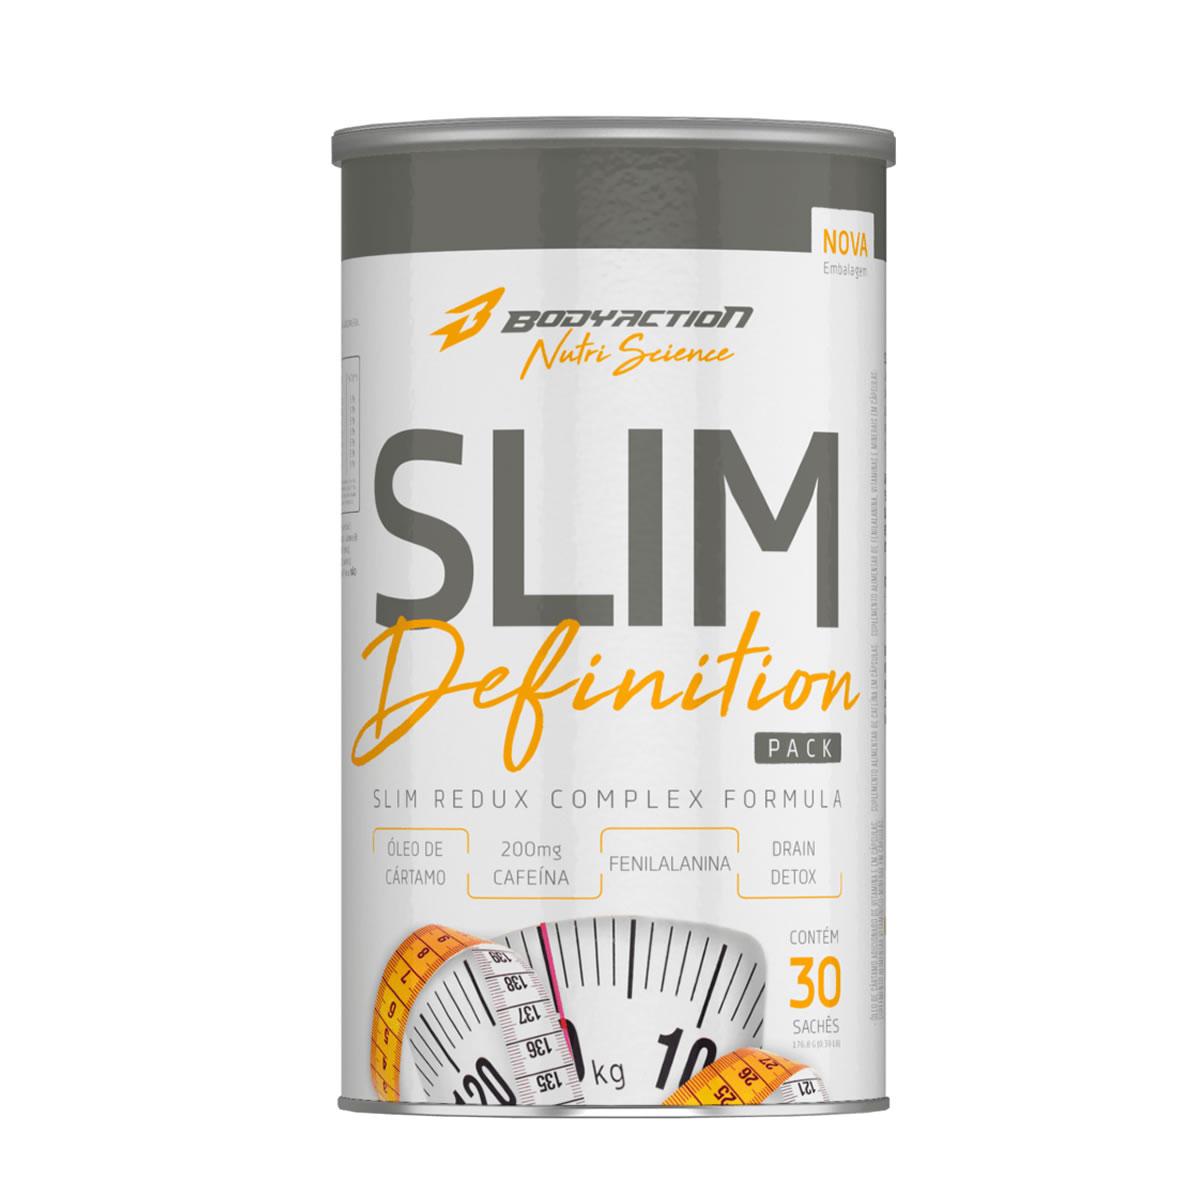 Slim Definition PRO-F com 30 packs - Bodyaction